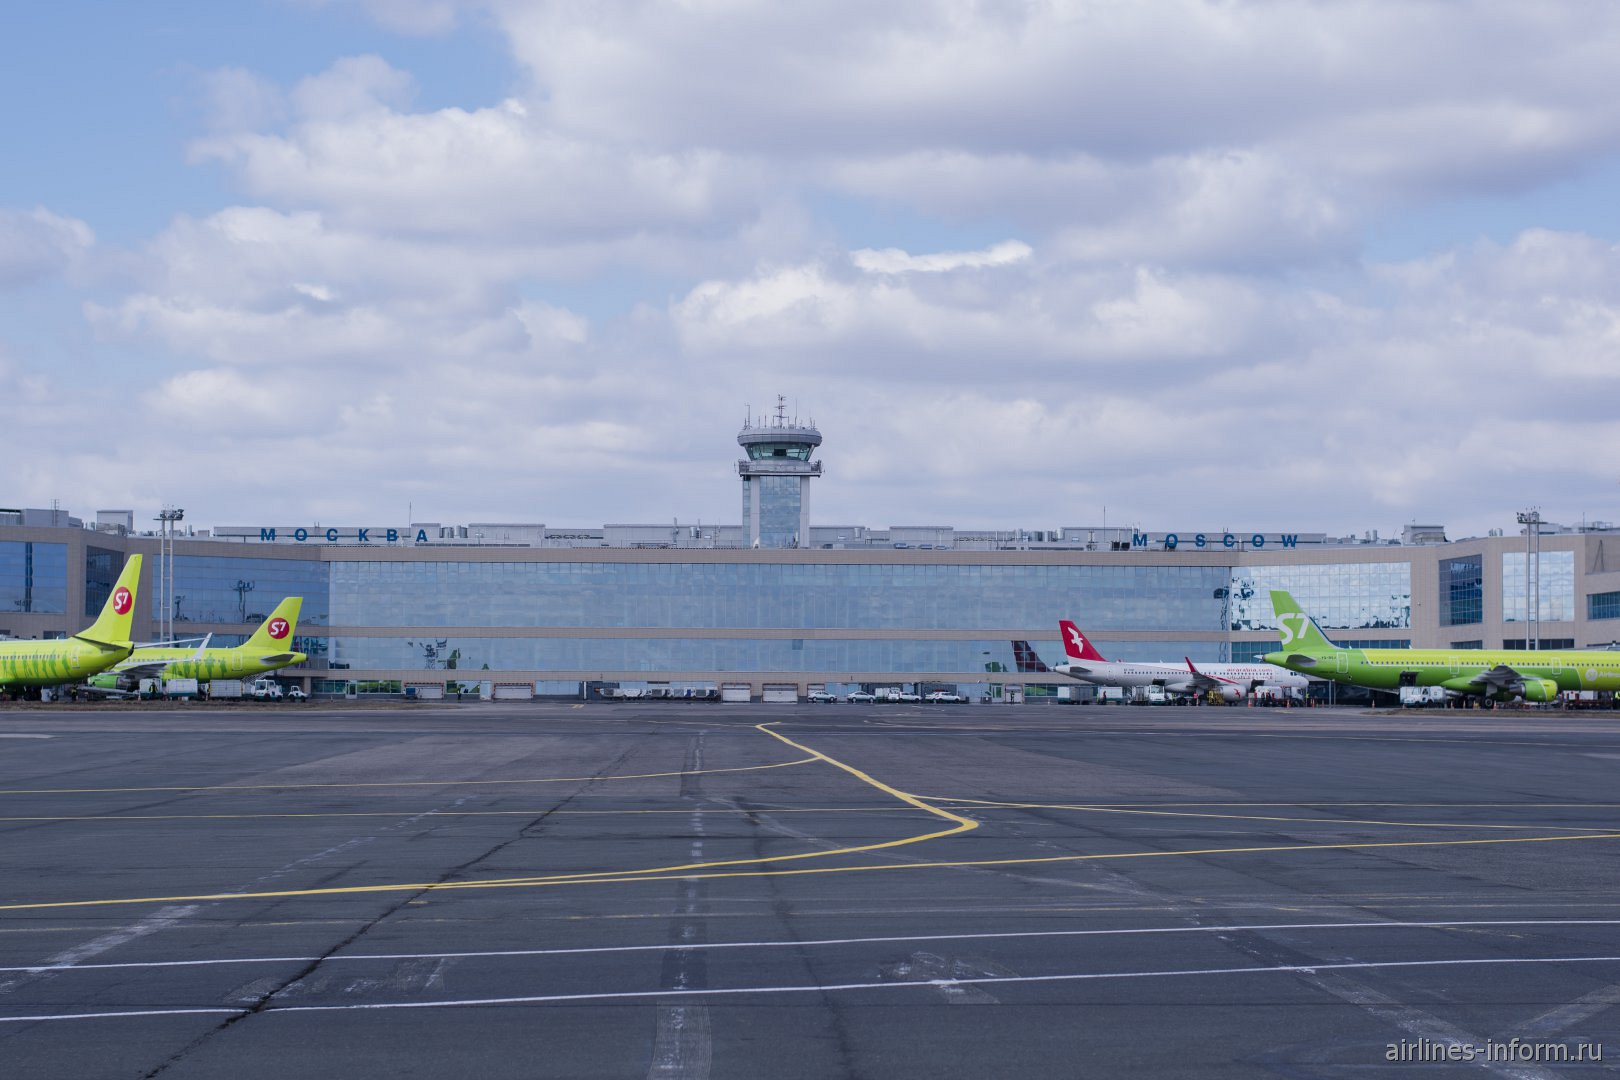 Вид с перрона на аэровокзал аэропорта Домодедово